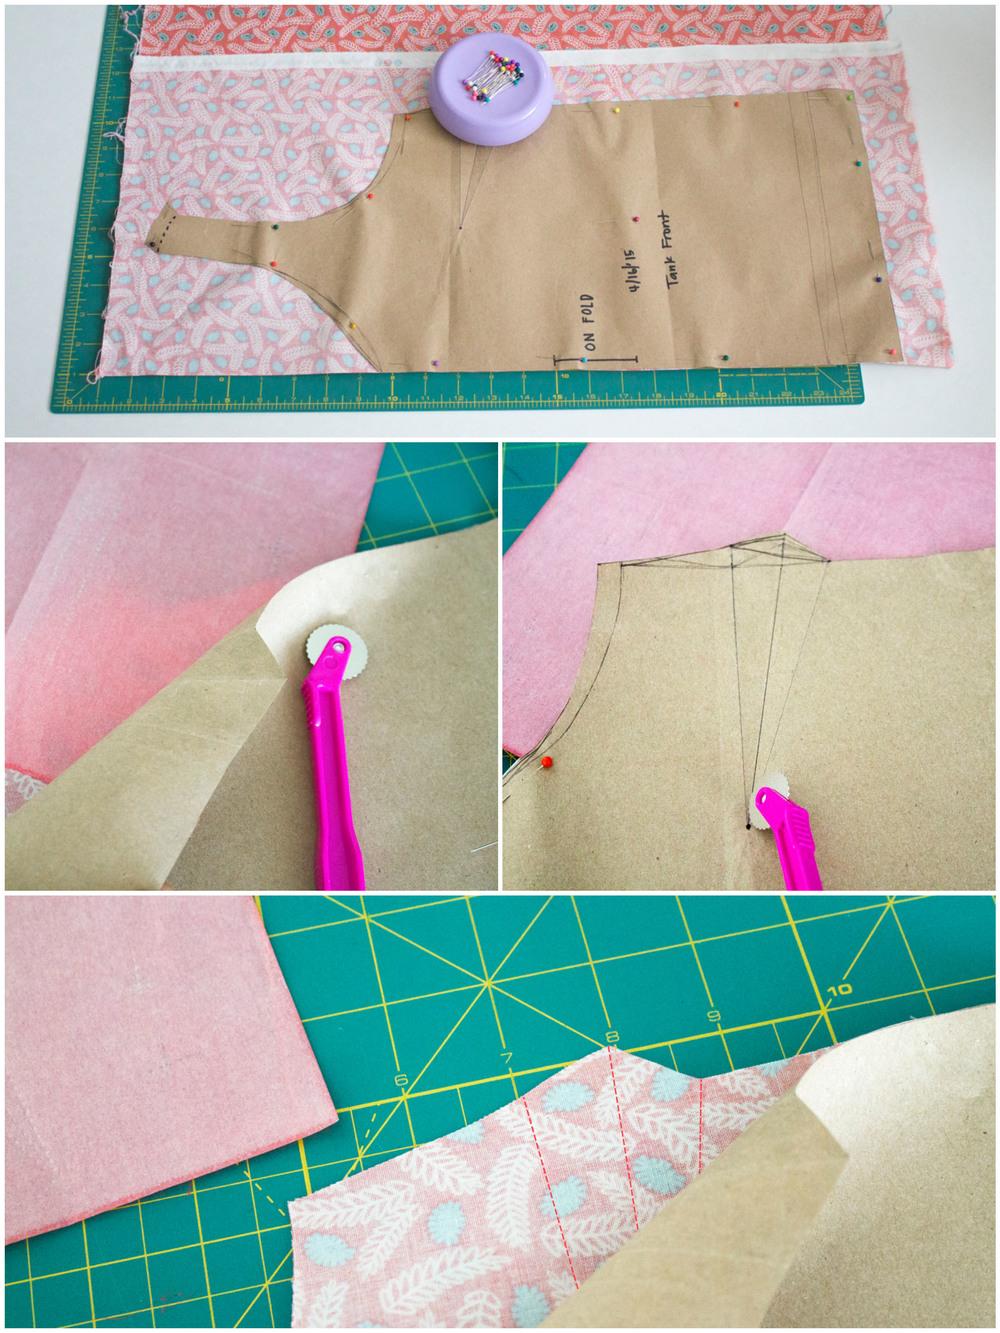 inkbyjeng_diy_sewing_racerback_tank_top_prepping_fabric.jpg